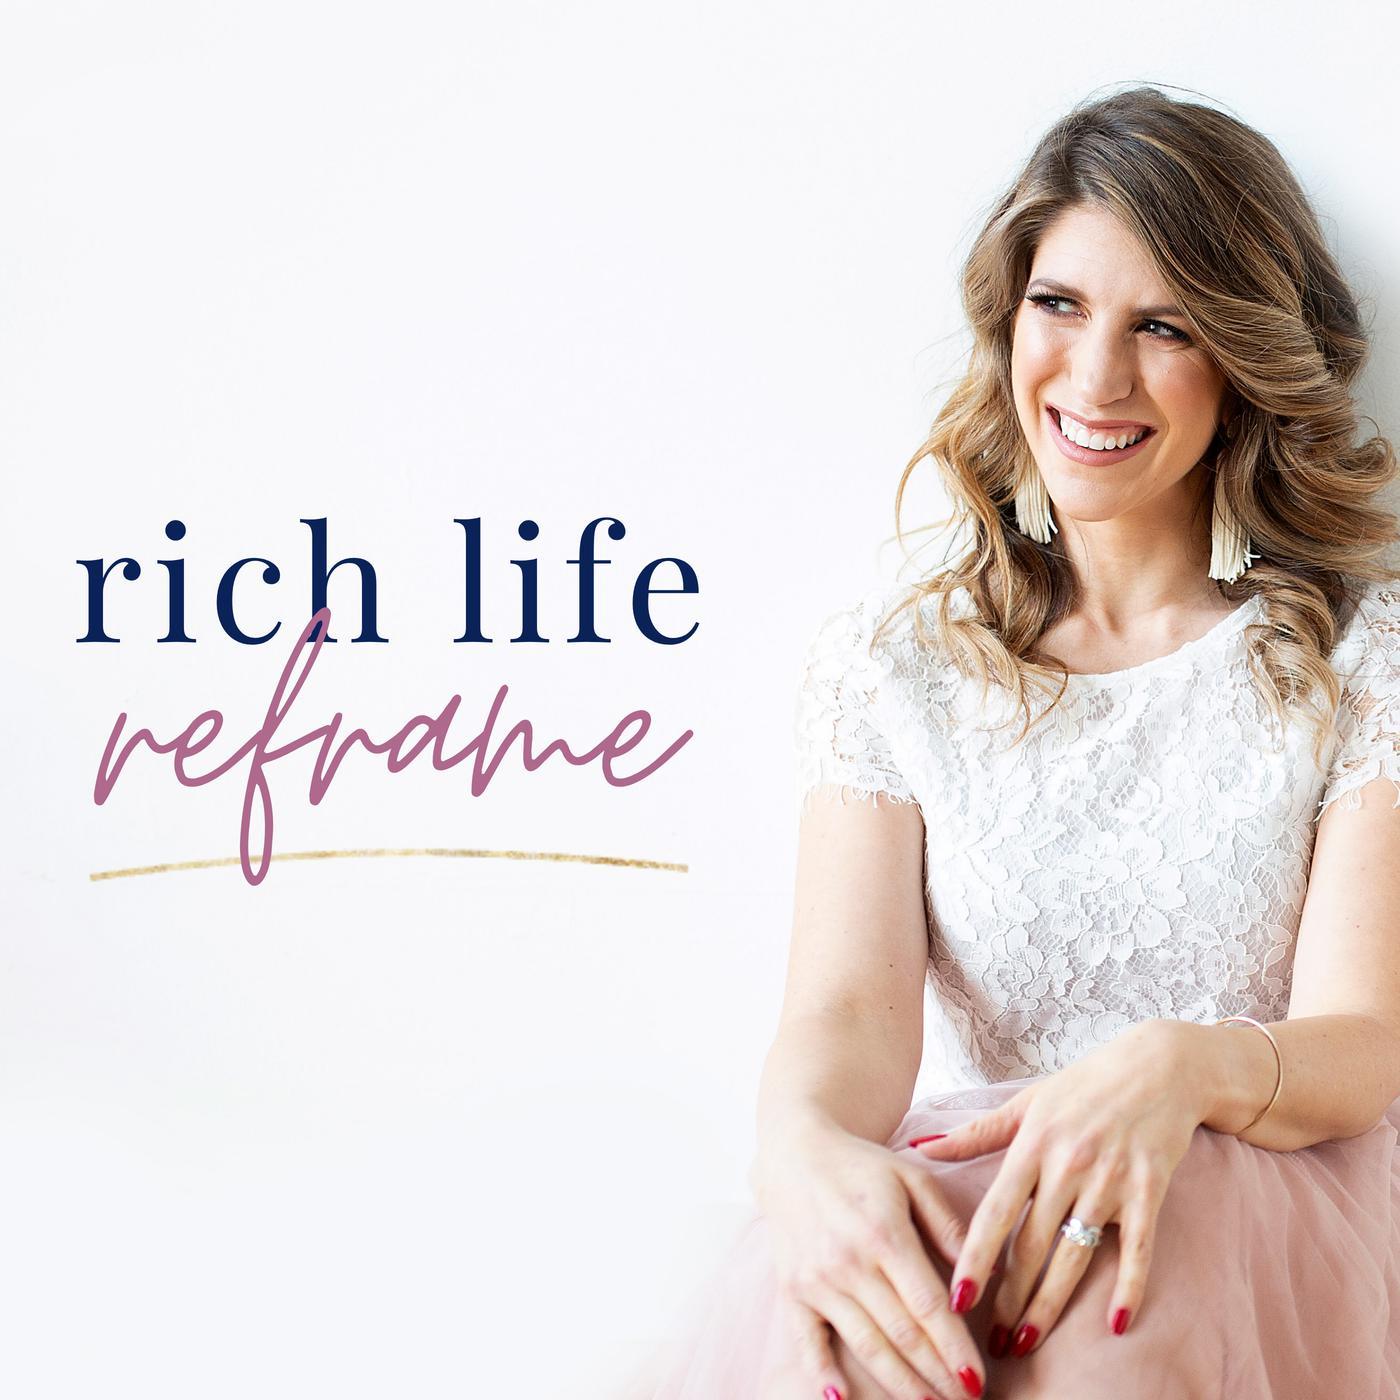 rich-life-reframe-allie-bjerk-vFa_M1SD-9p-0dhpXCqZ84F.1400x1400